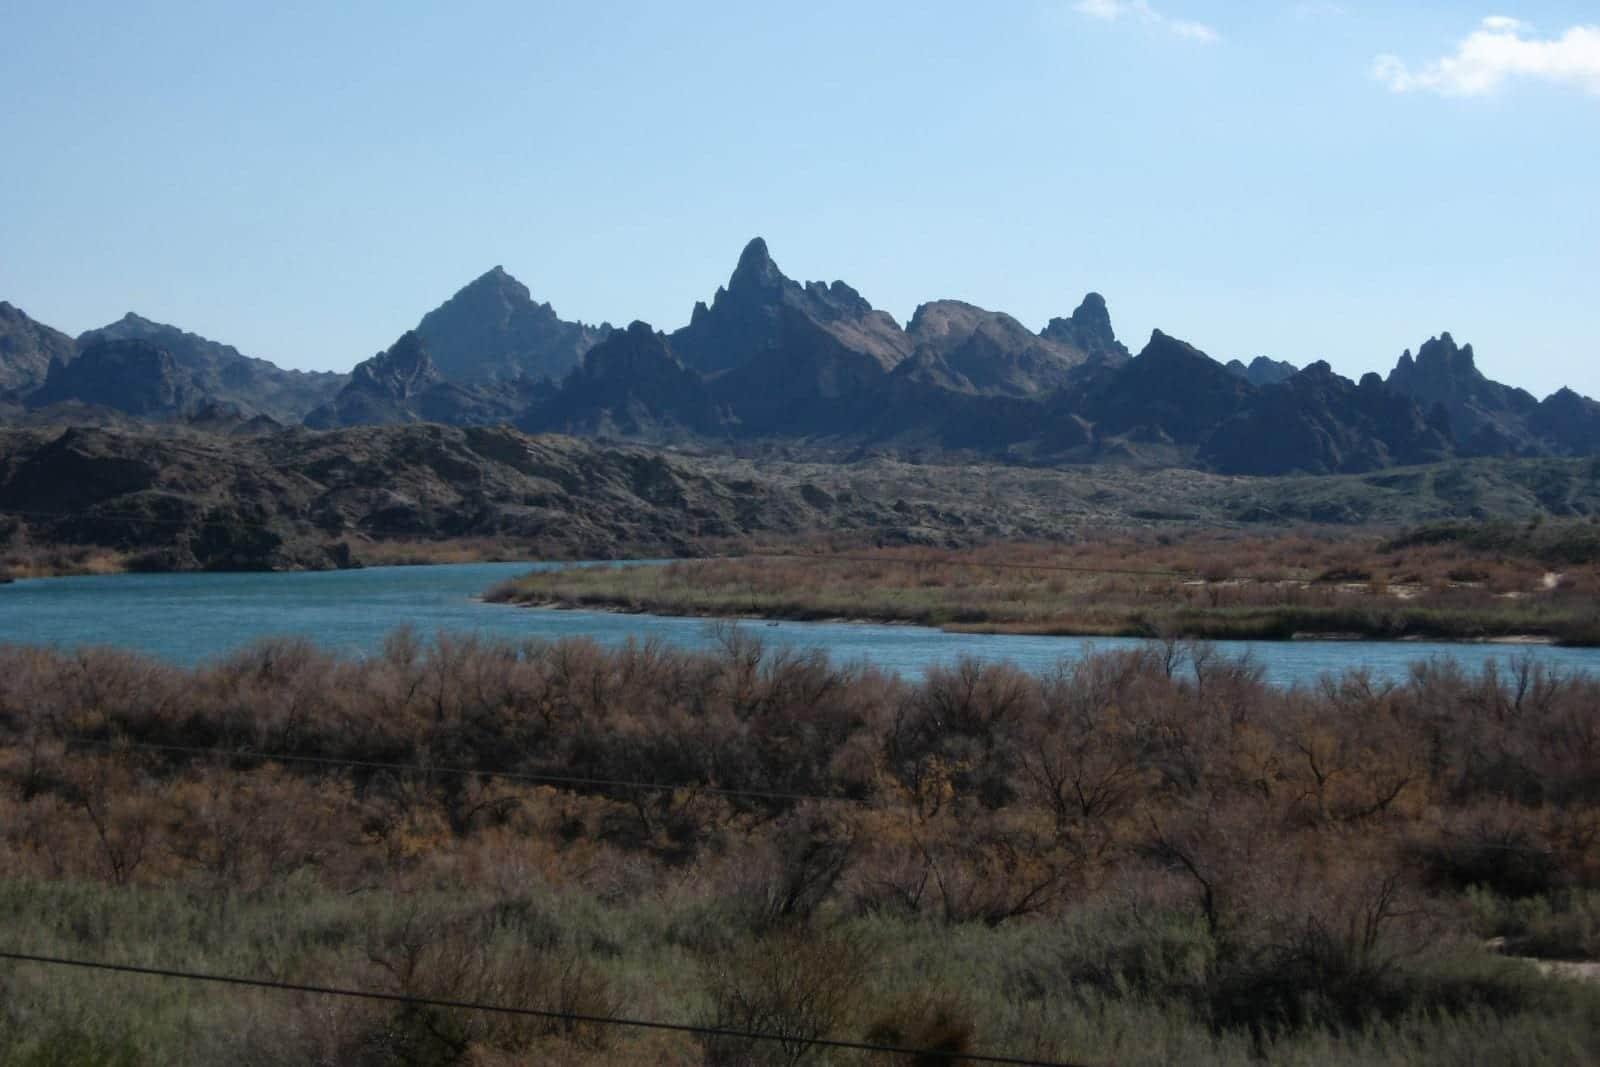 Lower Colorado River Needles California